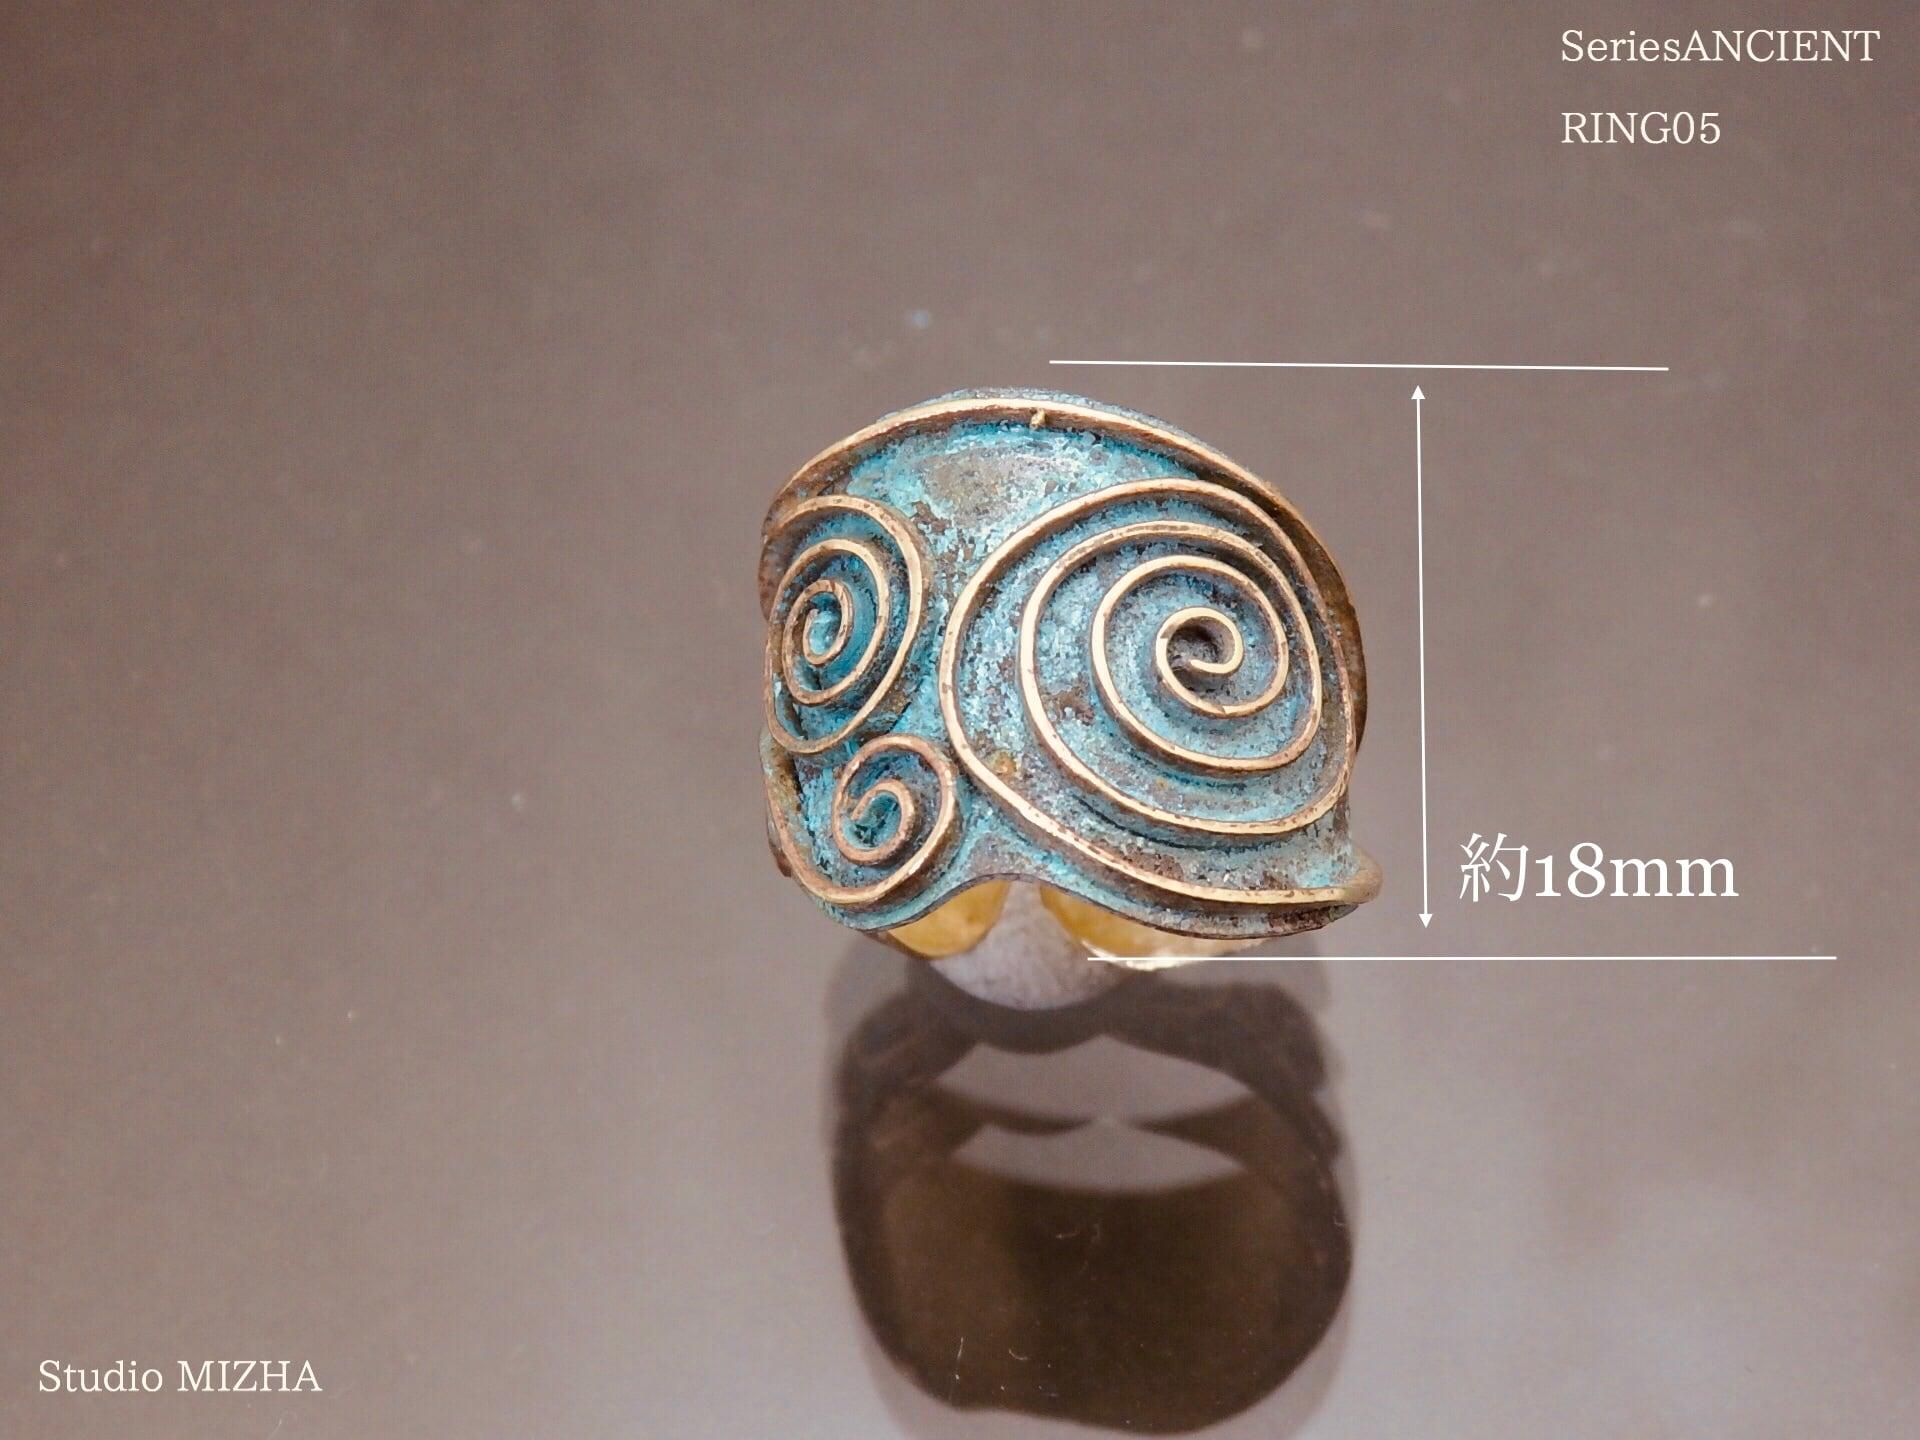 ANCIENT(RING-05)